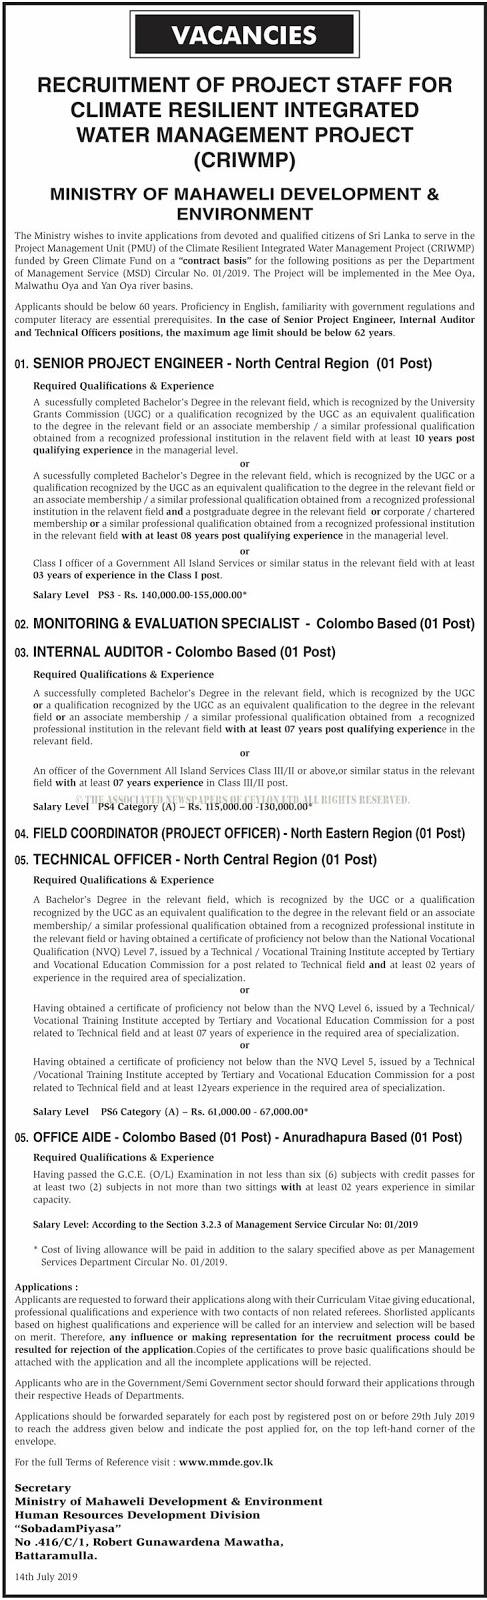 Vacancies at Ministry of Mahaweli Development and Environment